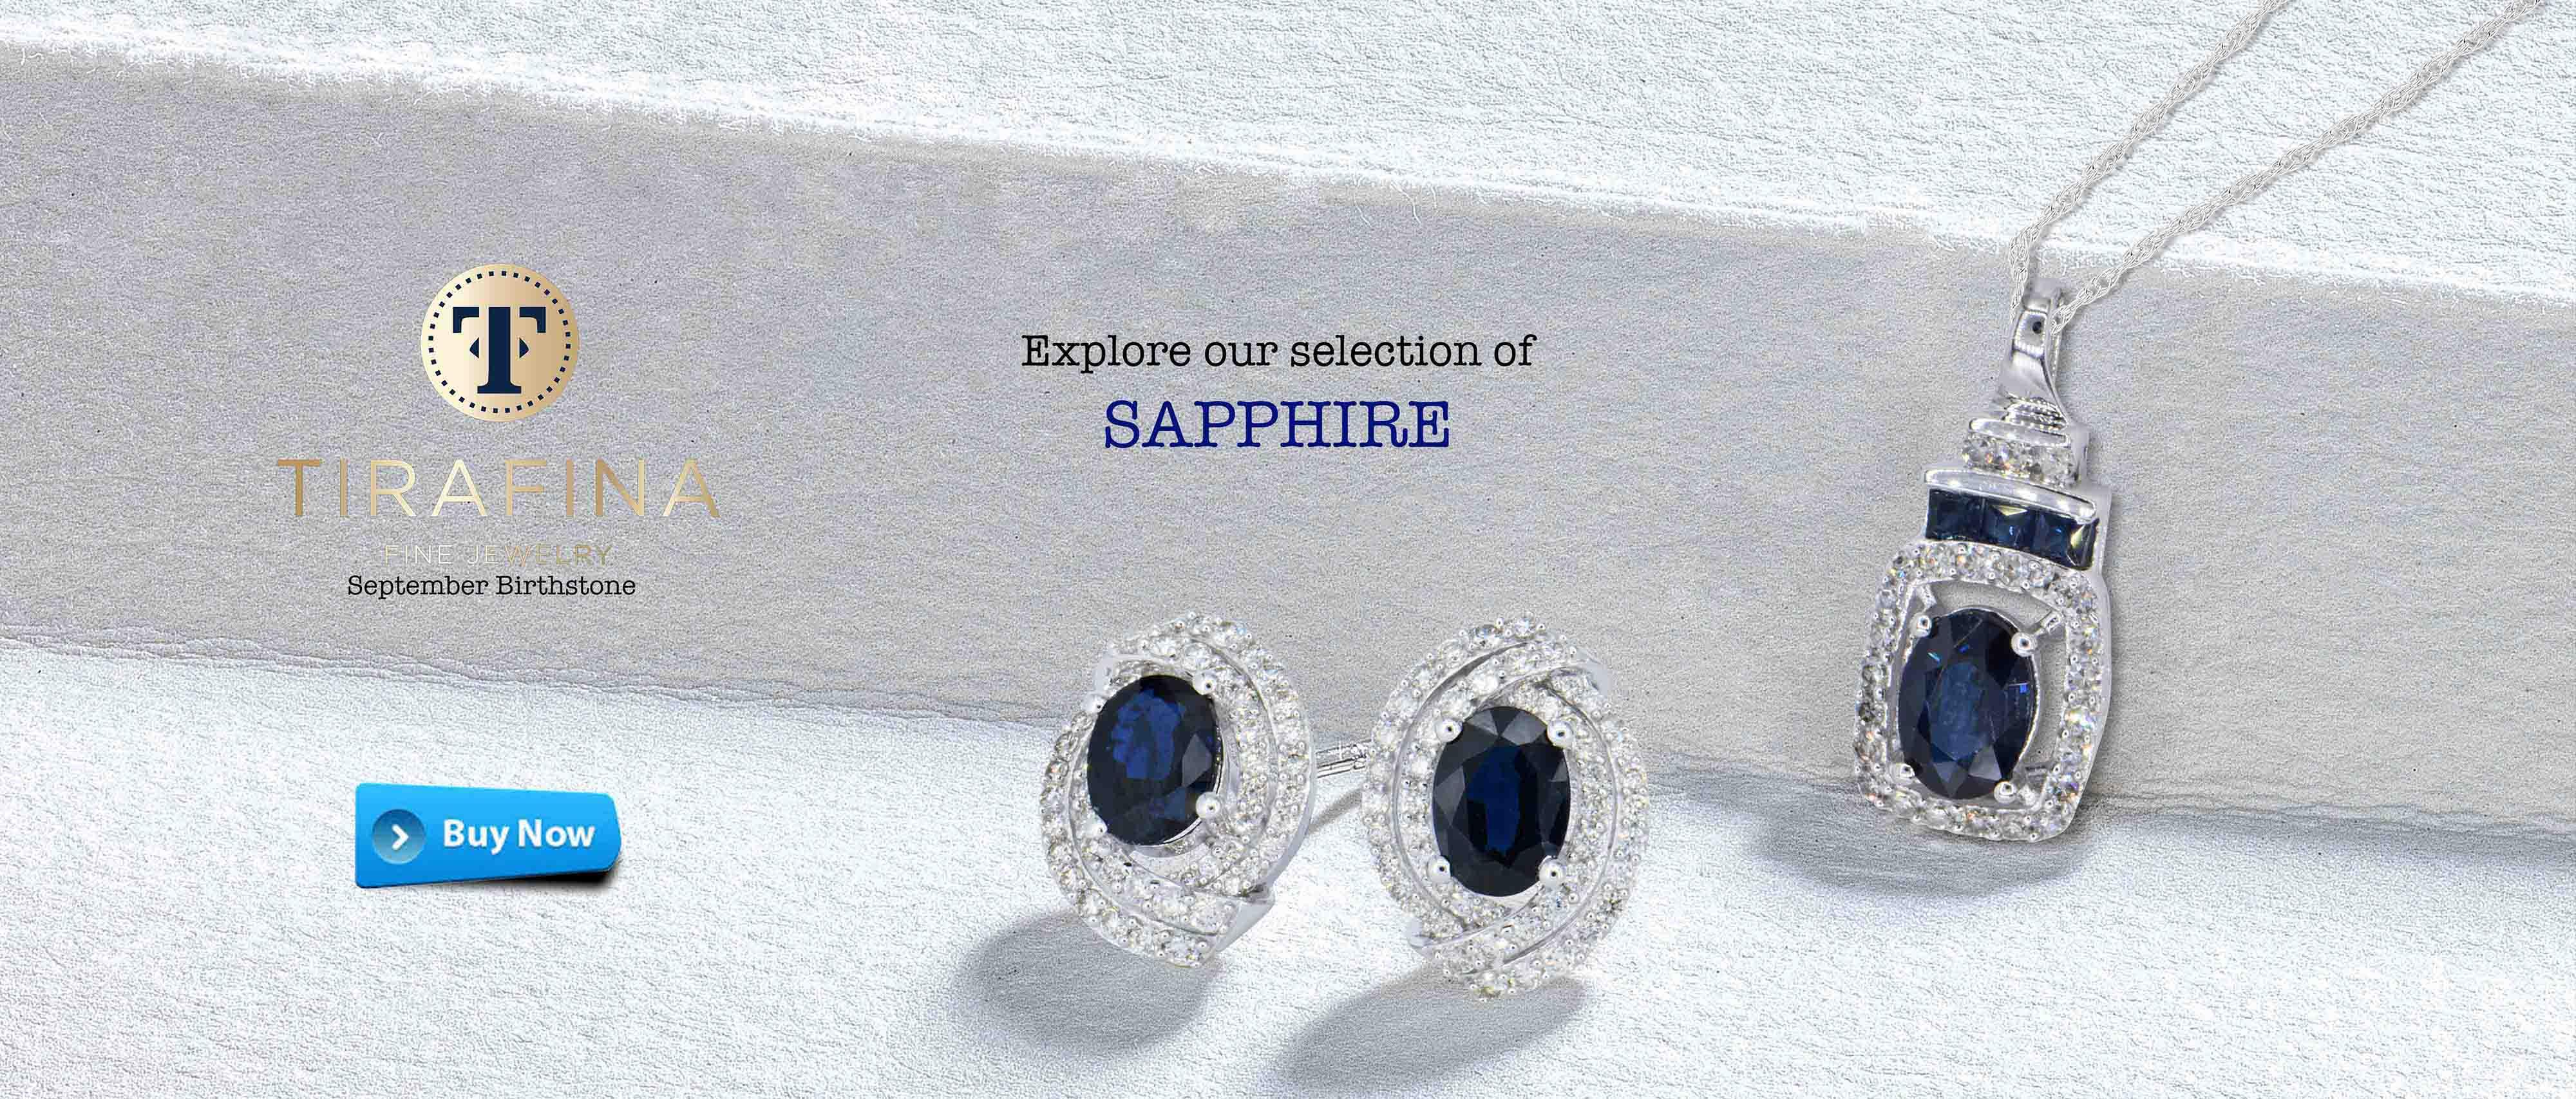 Tirafina Sapphire